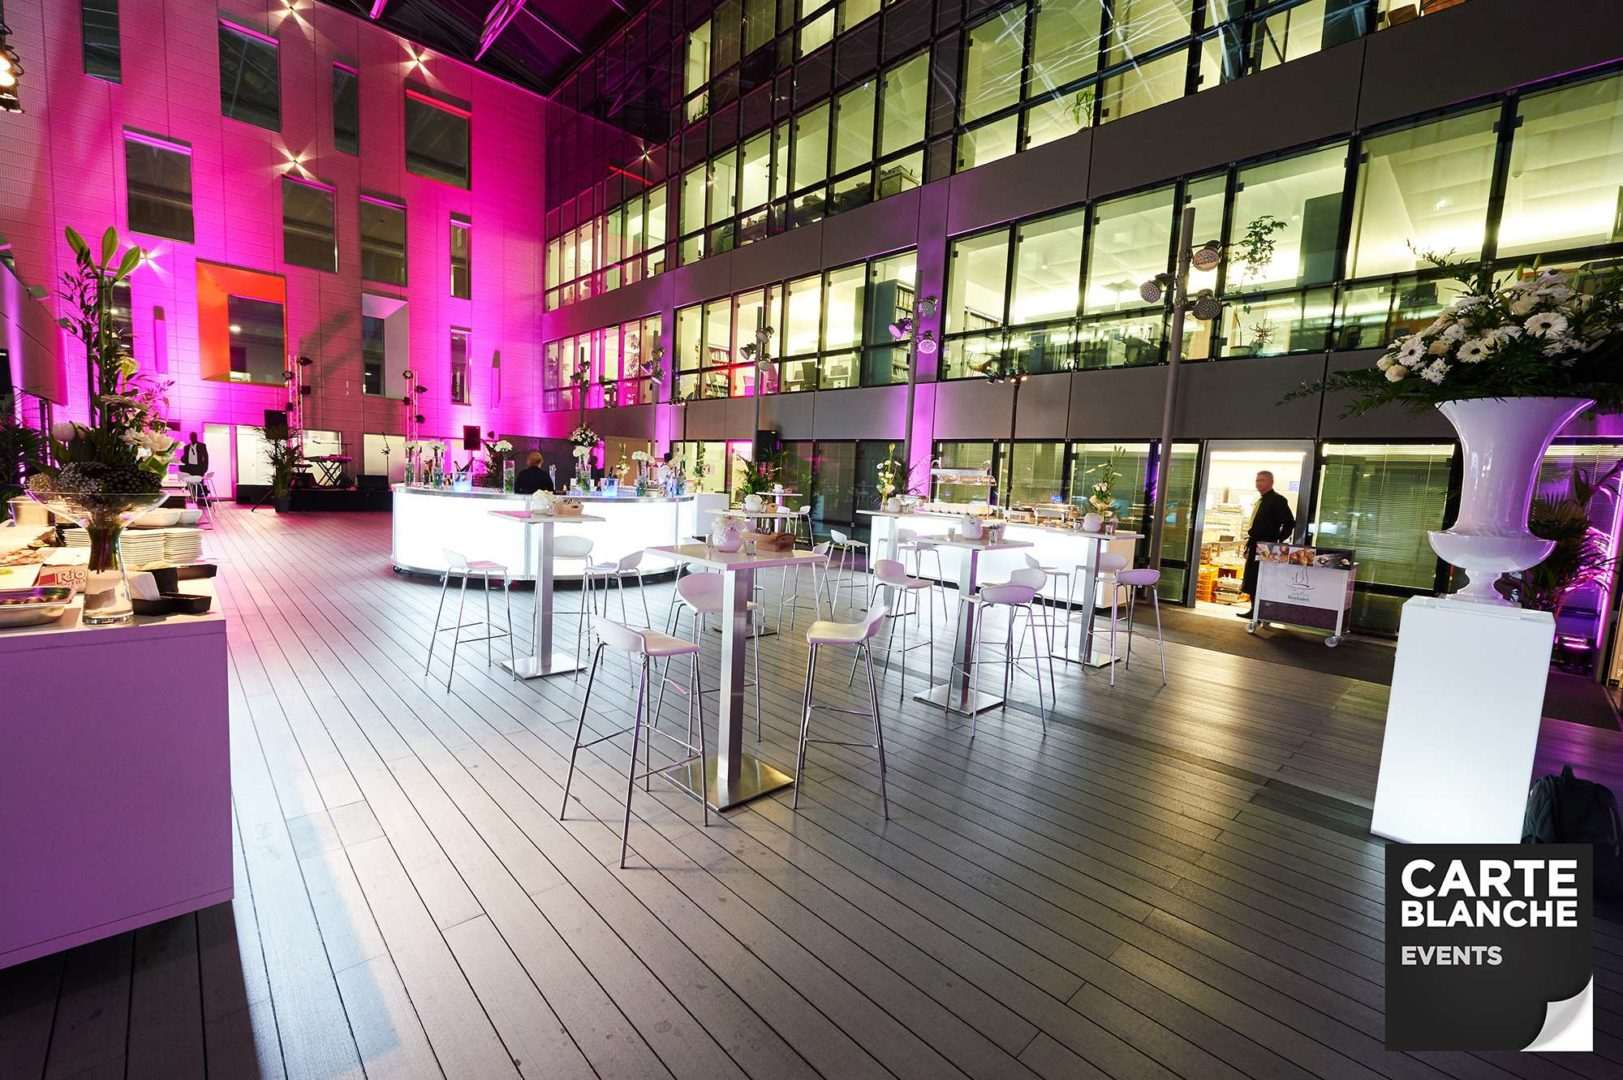 xmas-degroof-petercam-2015-058-luxembourg-event